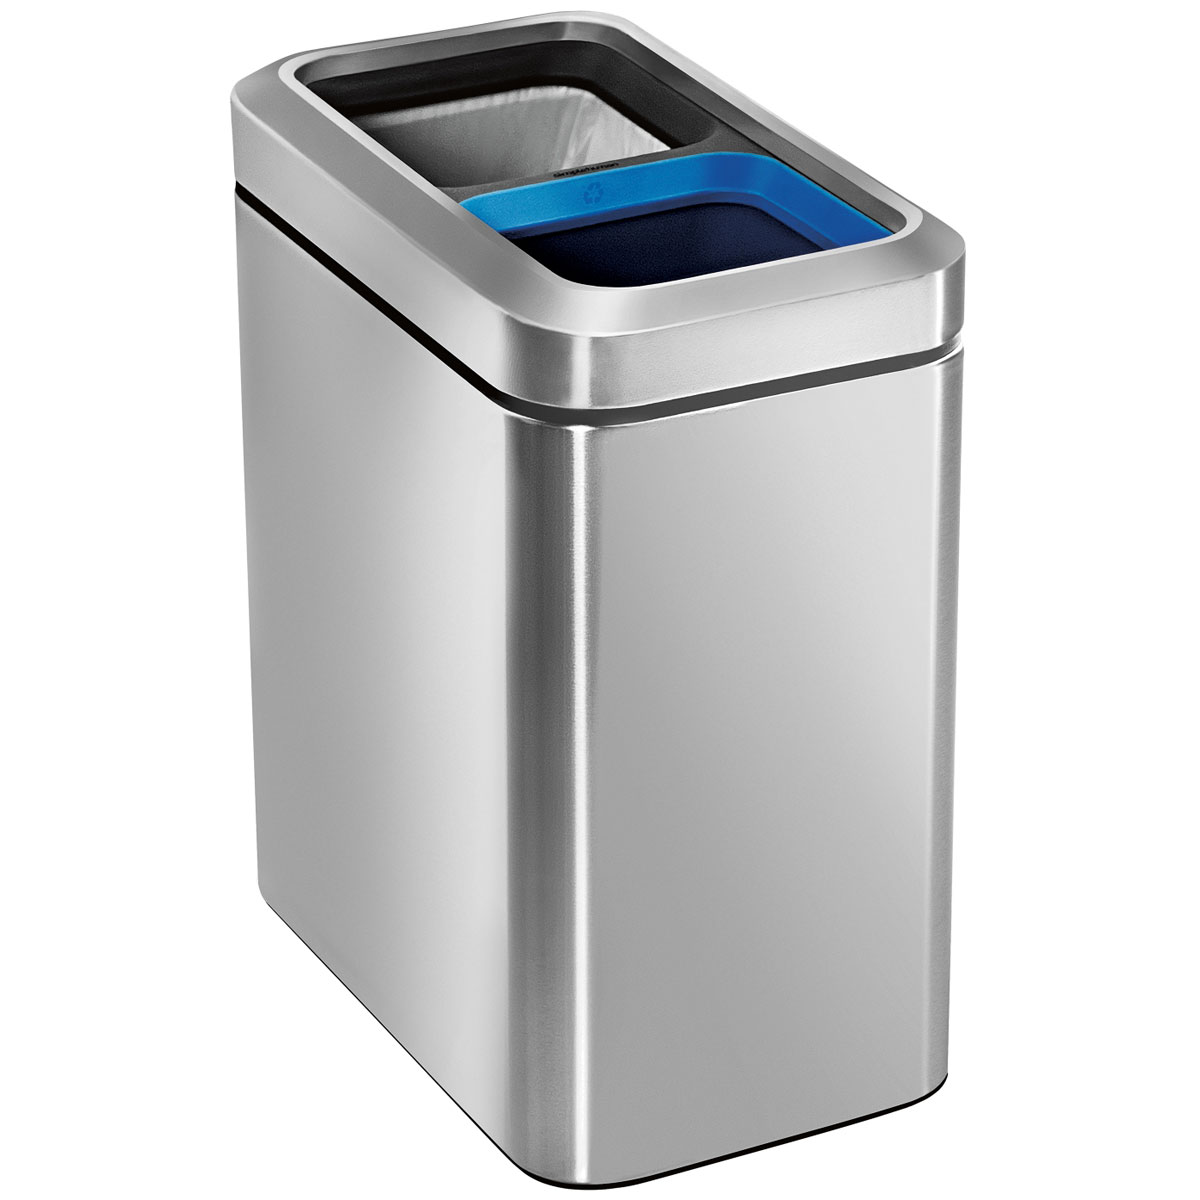 simplehuman ゴミ箱 分別スリムオープンカン 20L CW1470 ダストボックス ごみ箱 シルバー ステンレス 分別ゴミに対策に! シンプルヒューマン 正規品 1年間メーカー保証付き ゴミ箱 20リットル分別ゴミ箱(10L/10L)